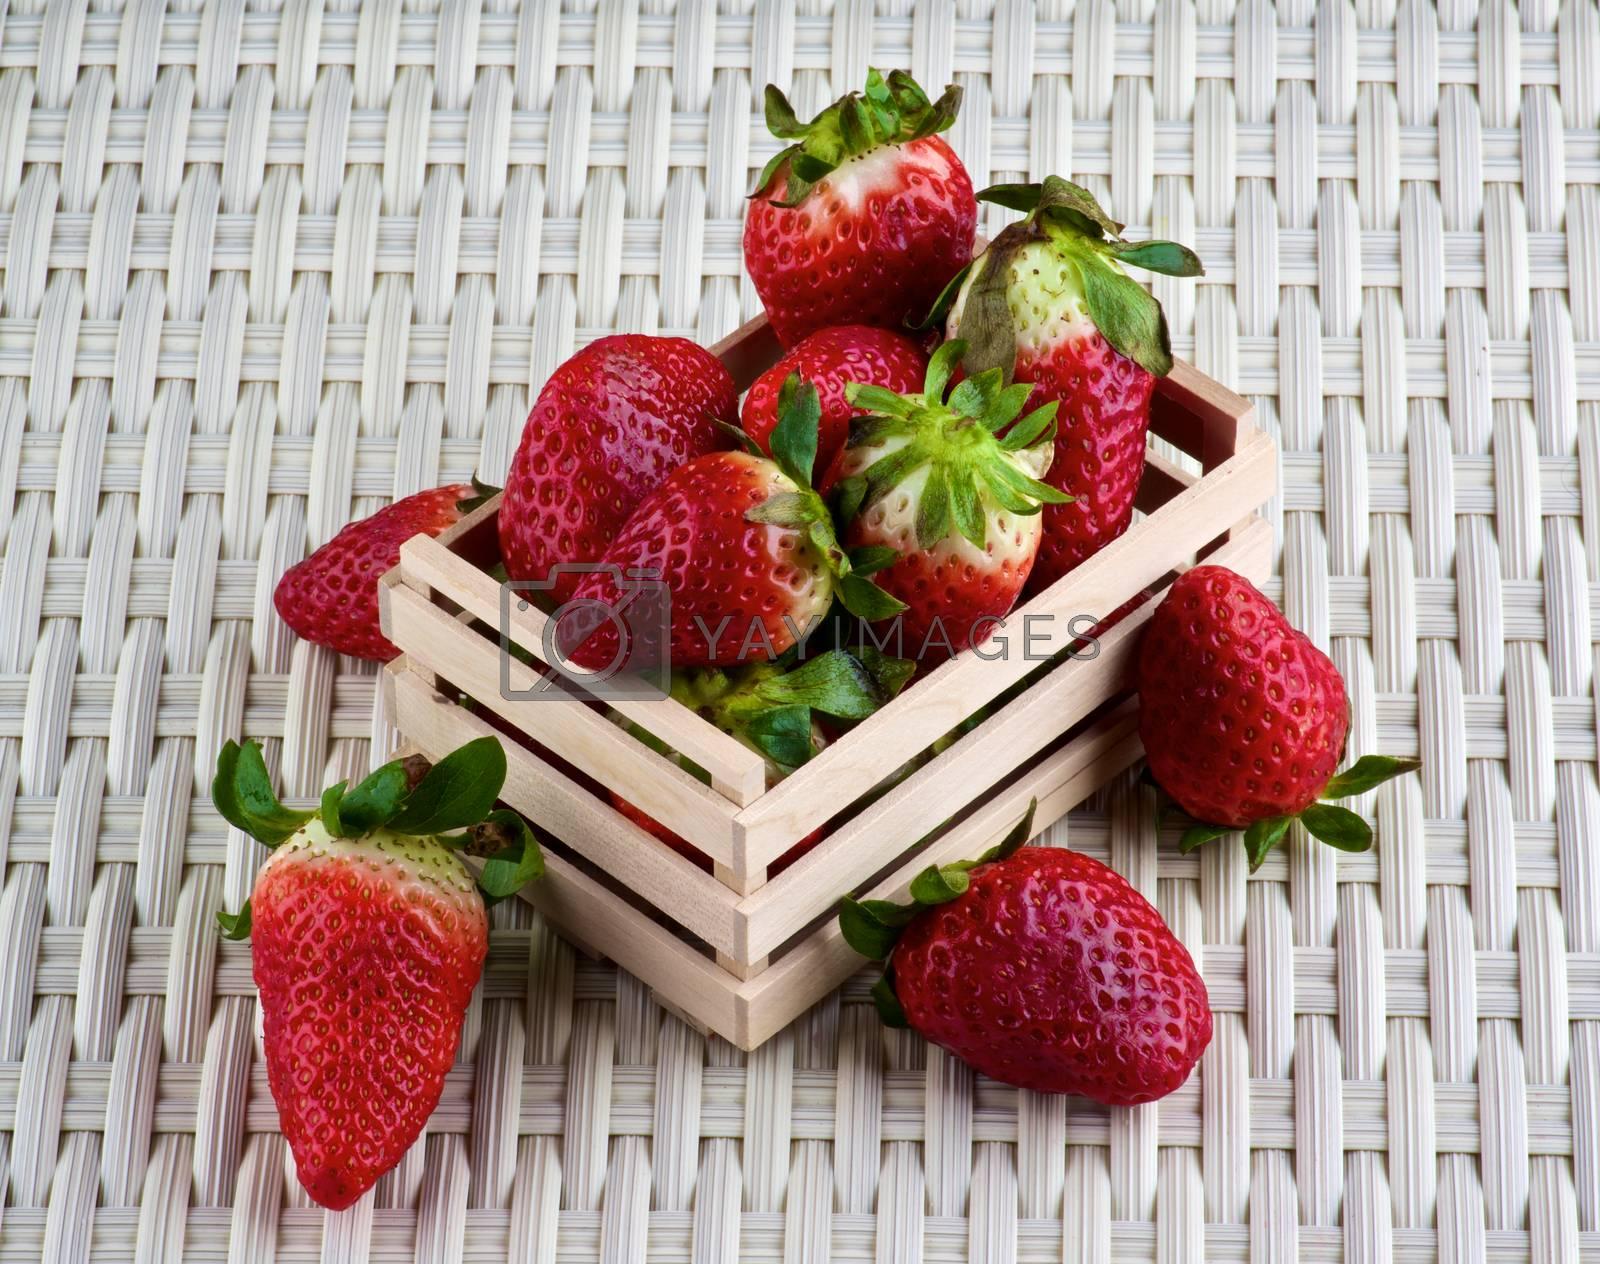 Arrangement of Fresh Ripe Strawberries in Wooden Tray closeup on Wicker background